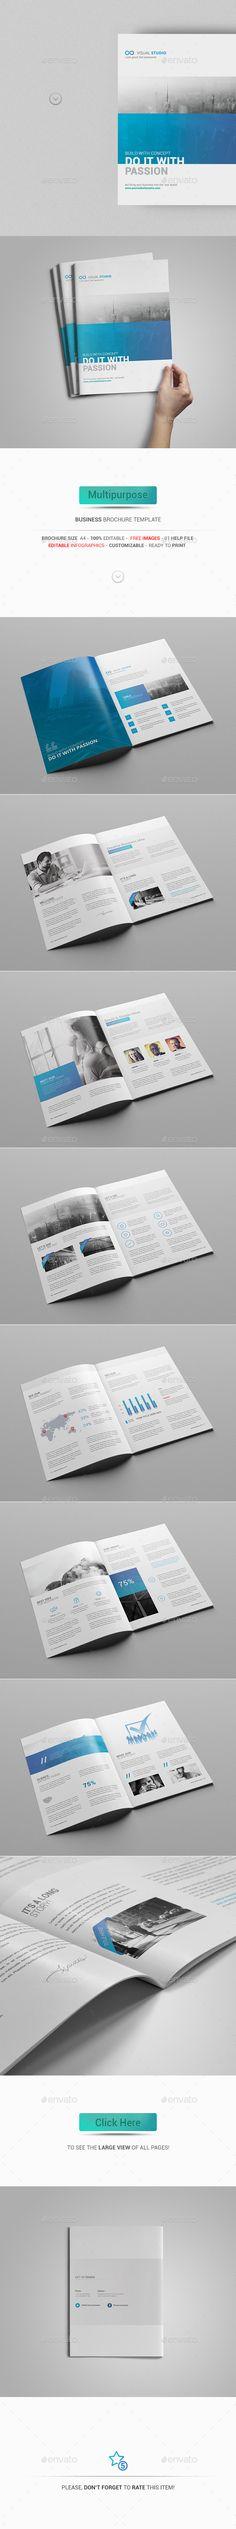 Multipurpose Business Brochure   PSD Template • Download ➝ https://graphicriver.net/item/multipurpose-business-brochure-template/12910268?ref=pxcr